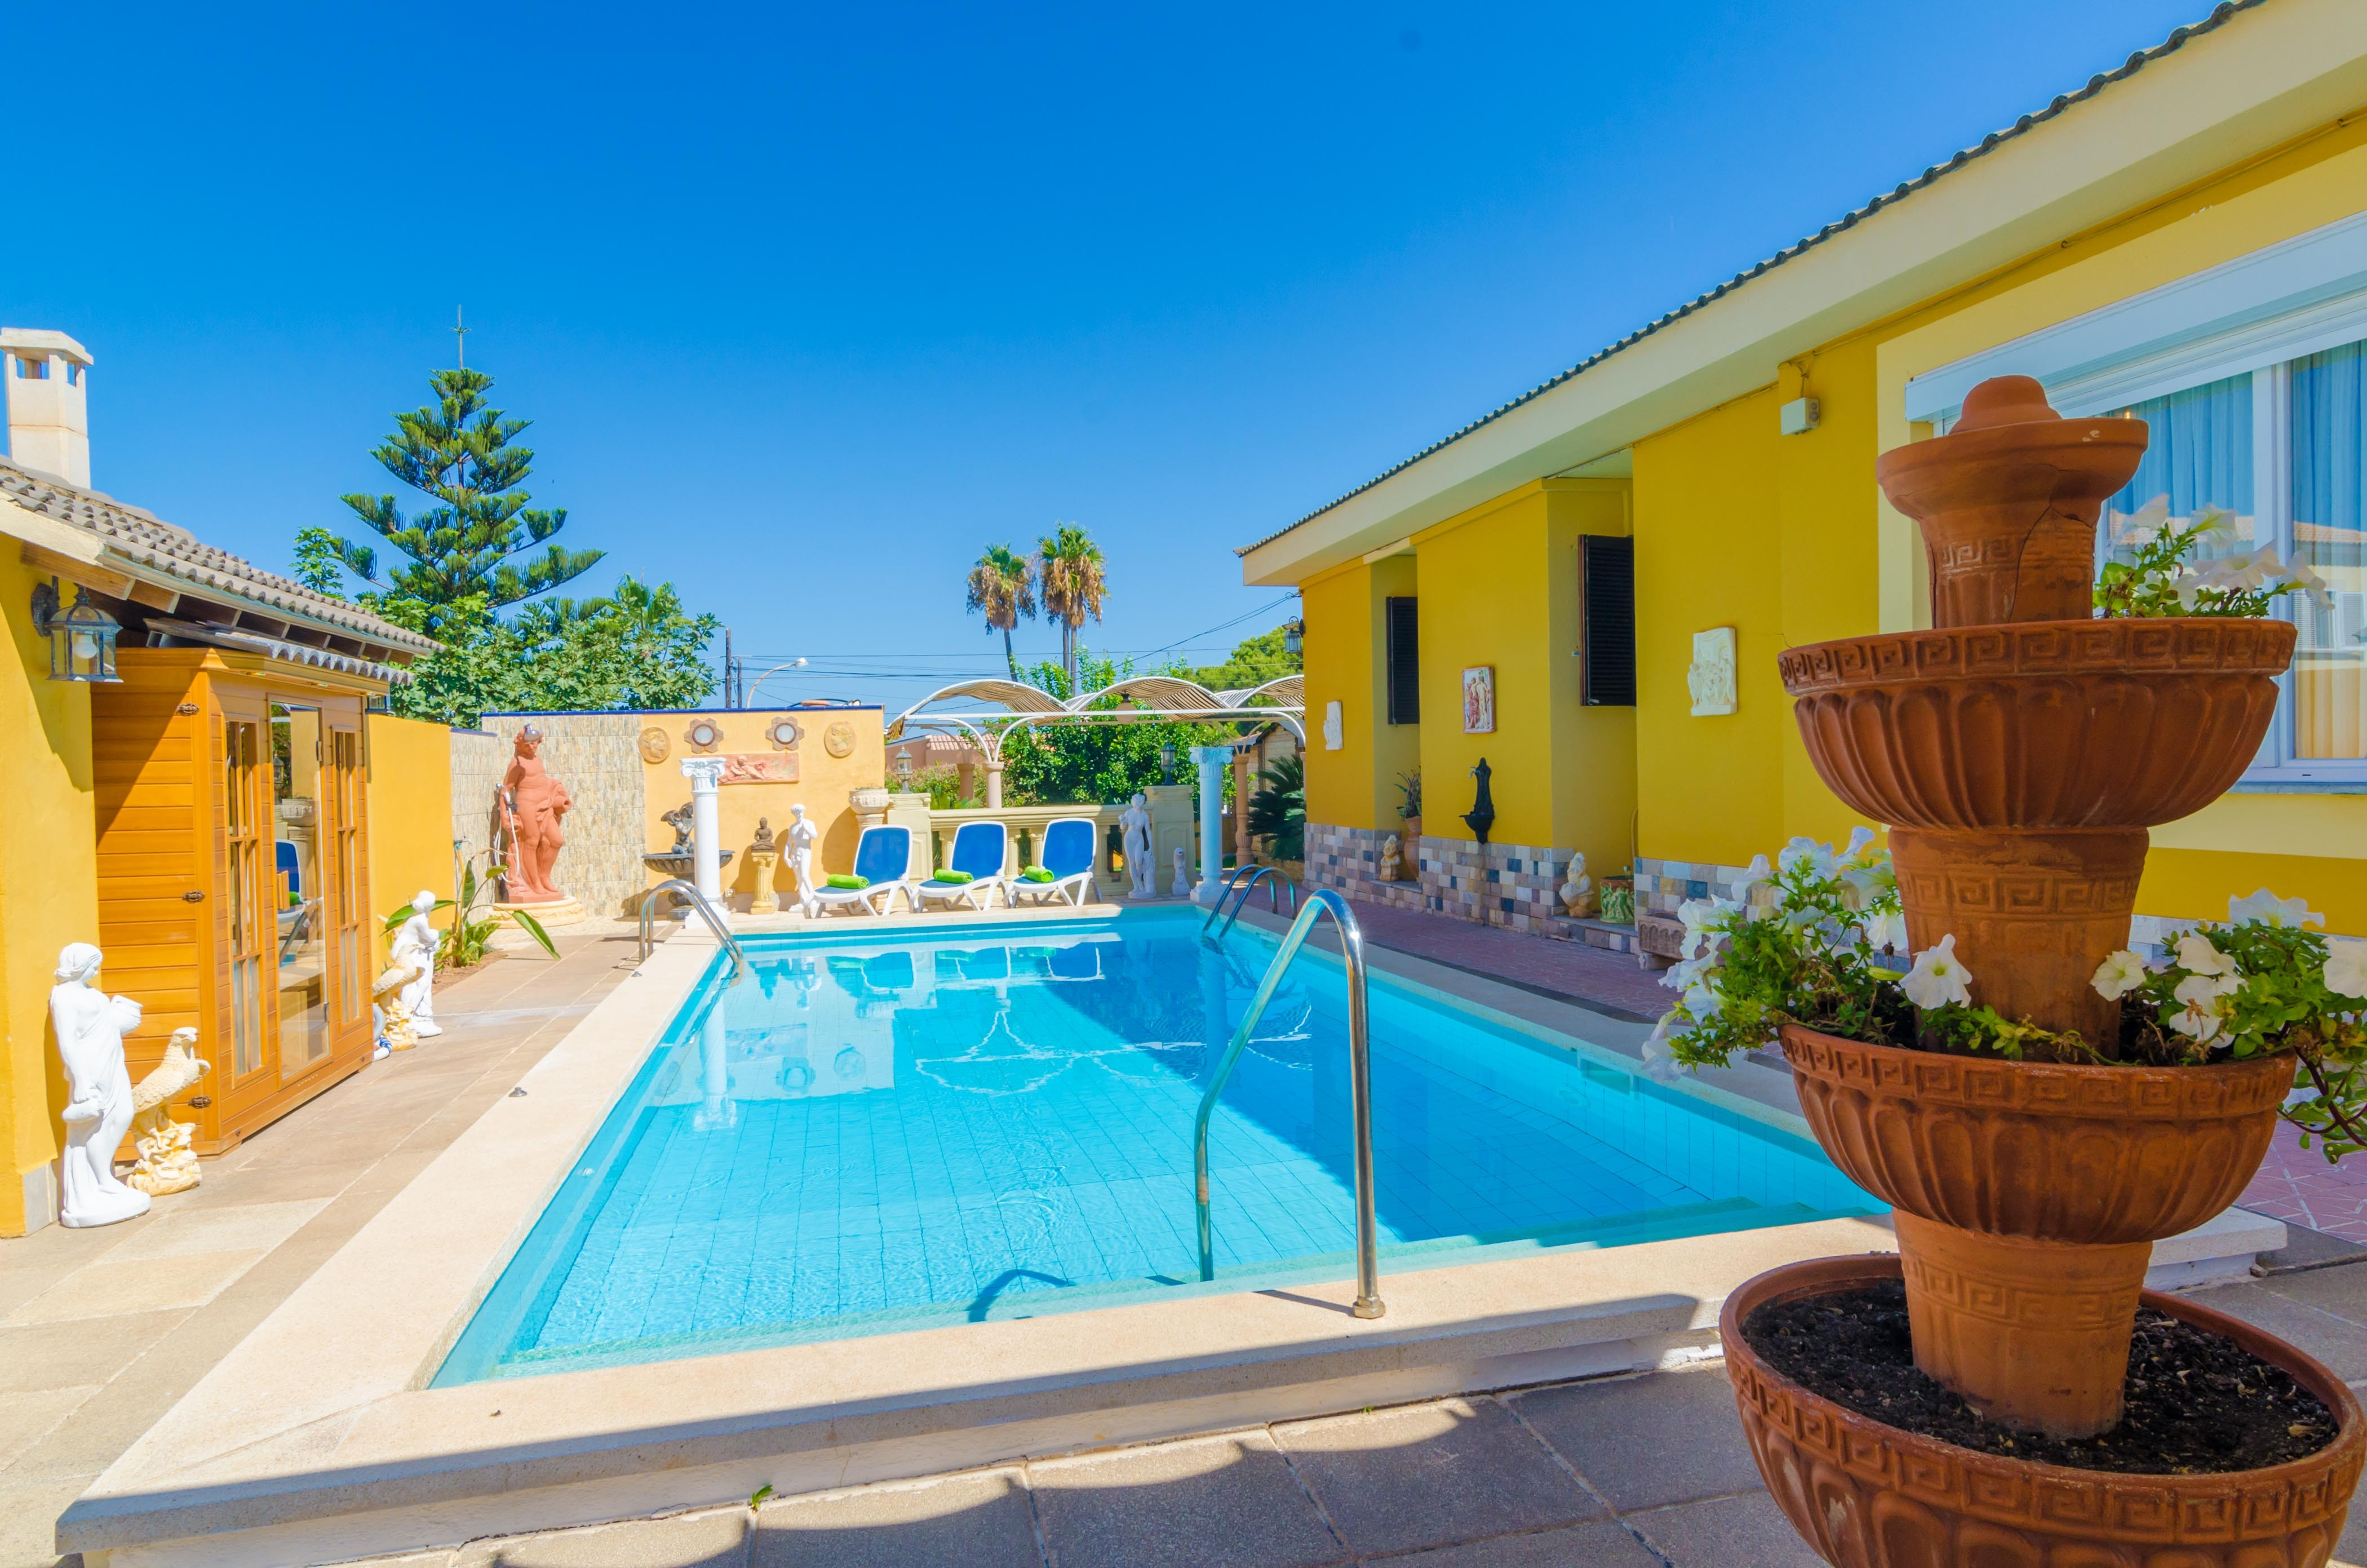 Ferienhaus CAN GORI (2296828), Badia Gran, Mallorca, Balearische Inseln, Spanien, Bild 27